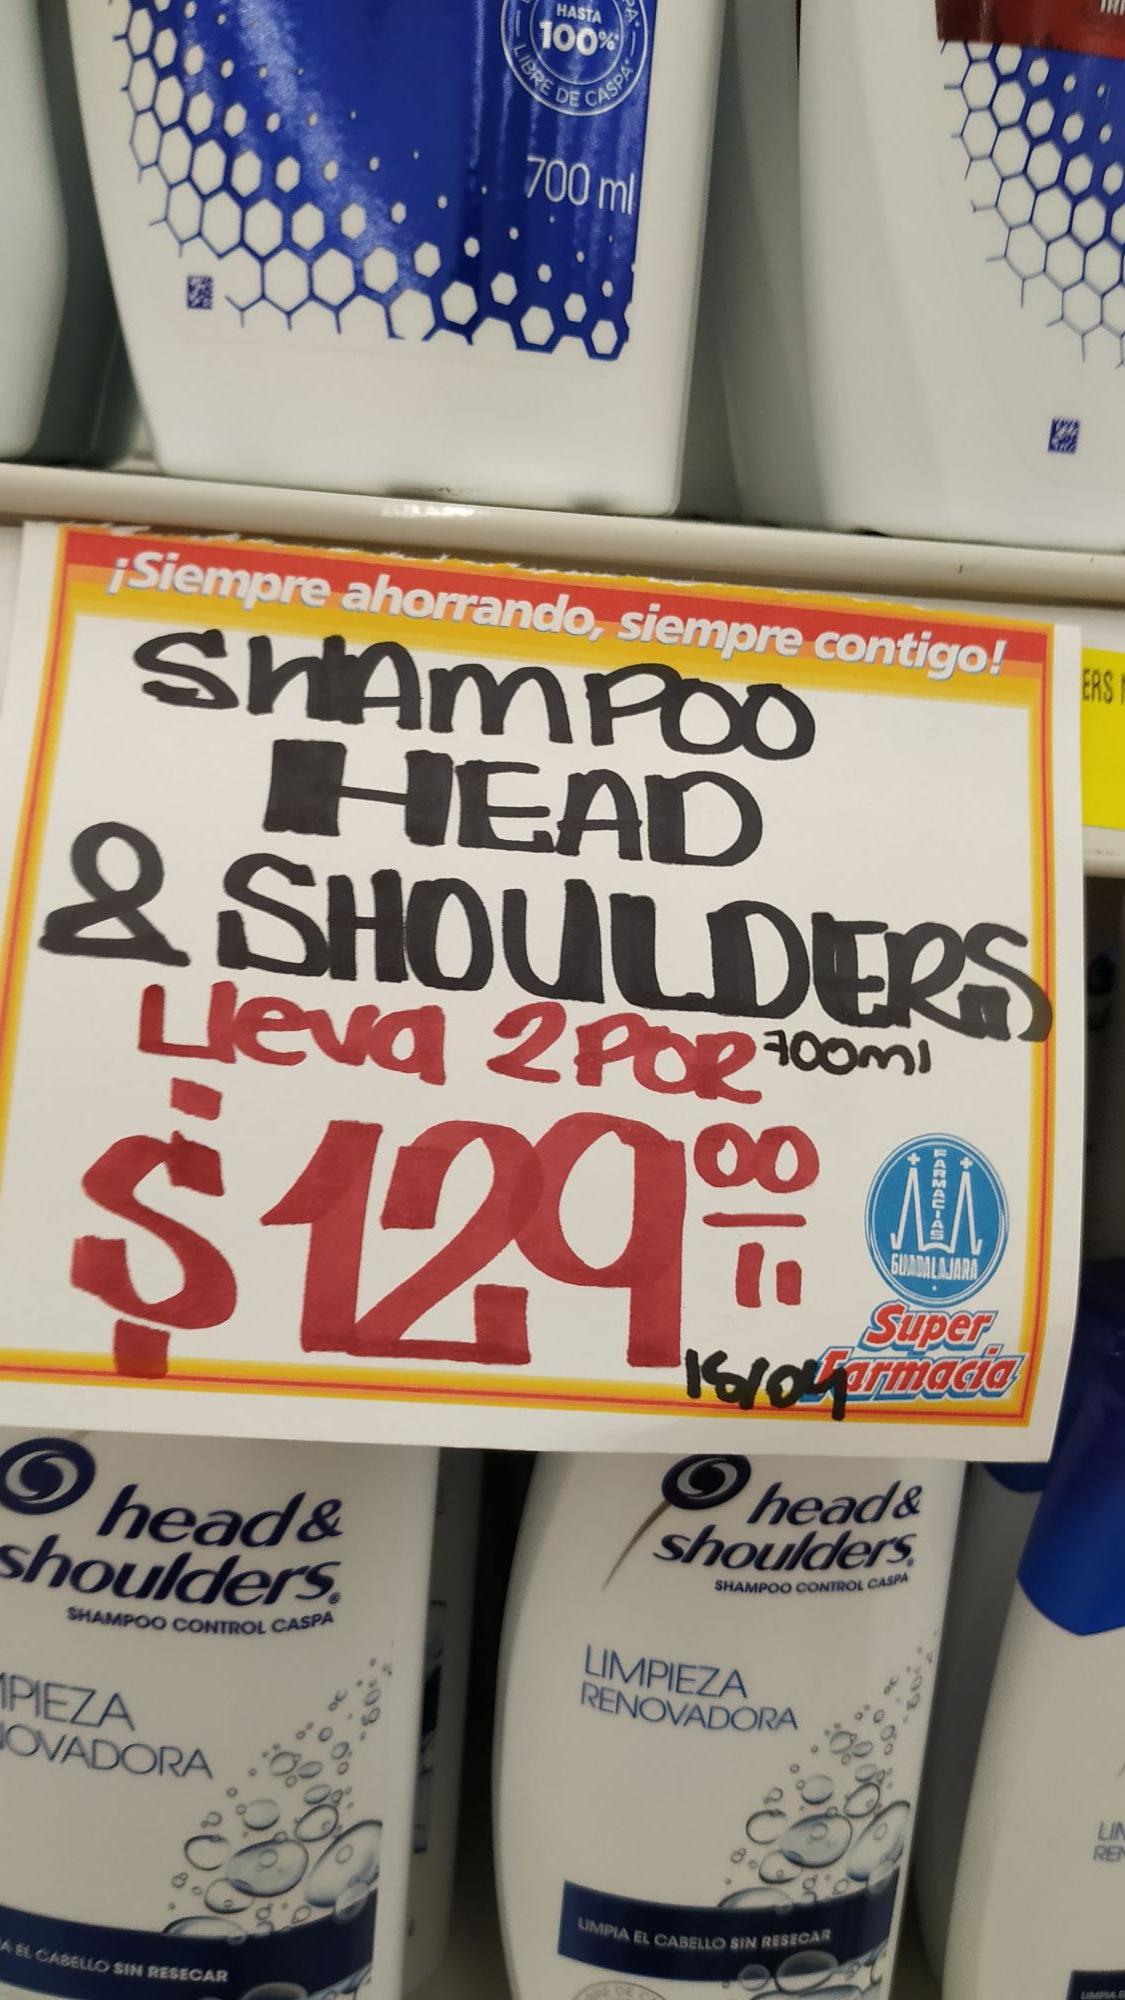 Farmacias Guadalajara: Shampoo Head & Shoulders 2x $129